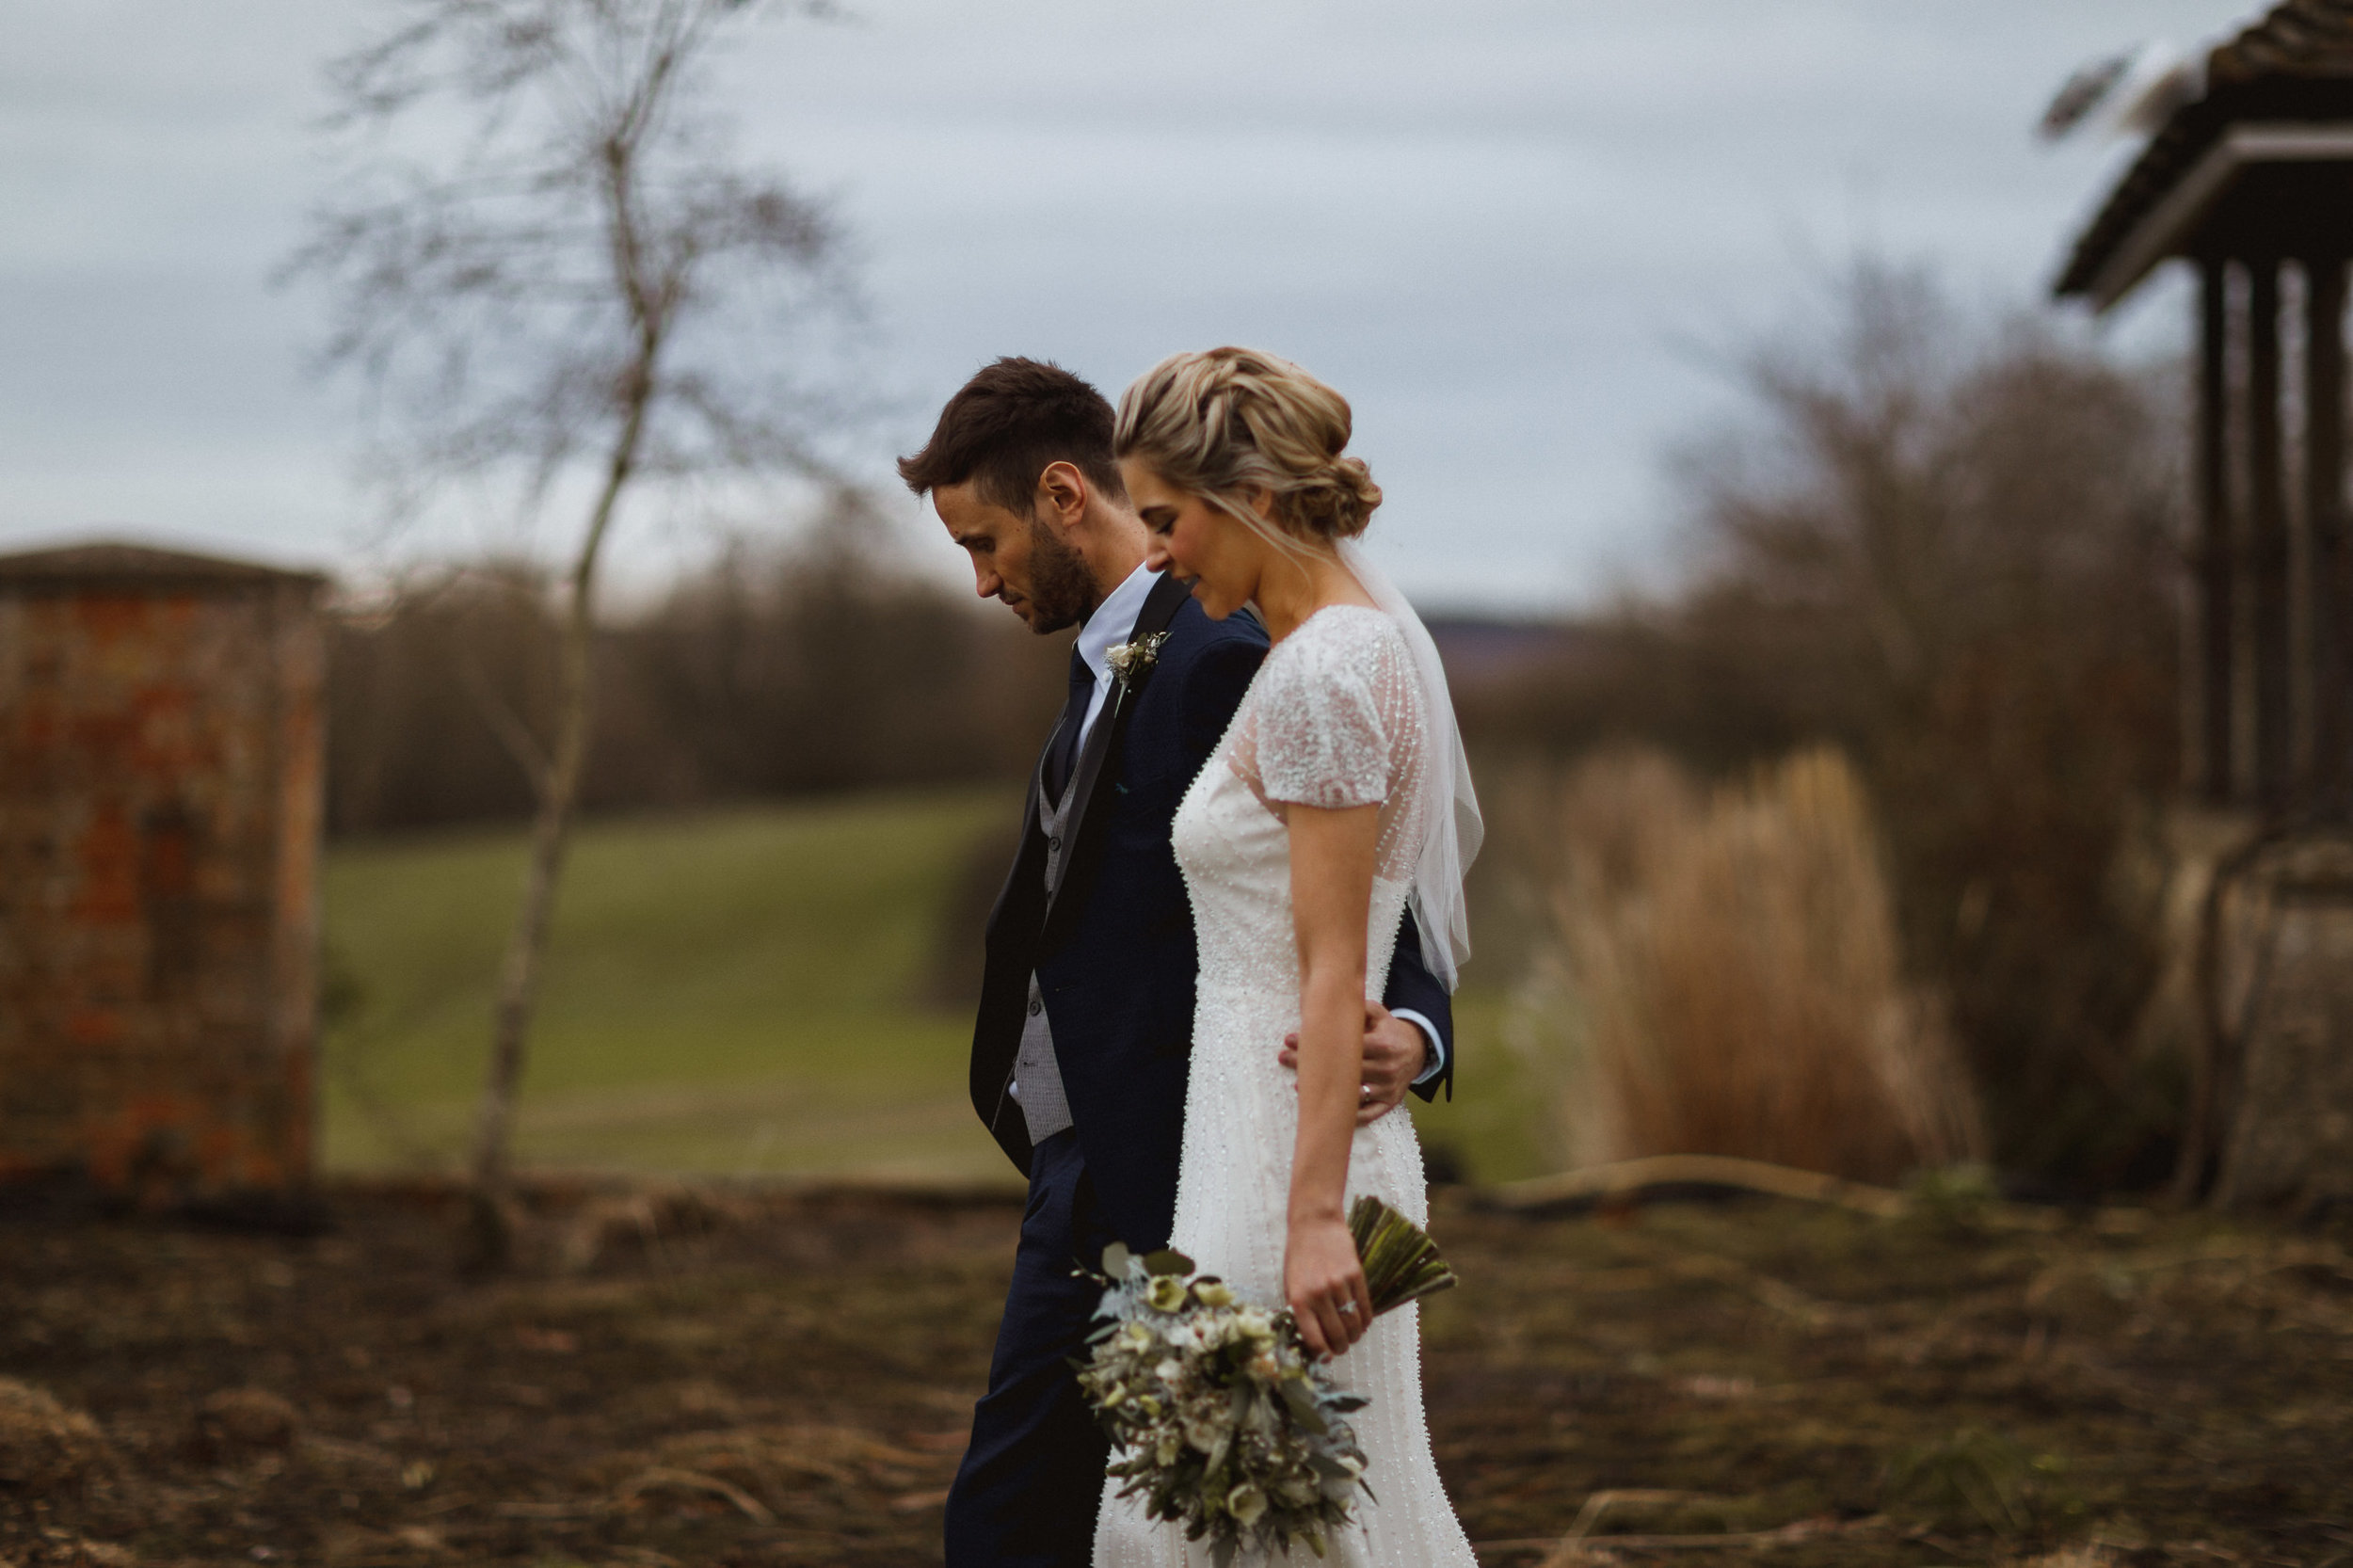 London_wedding_photographer_gione_da_silva_carelle_paul156.jpg